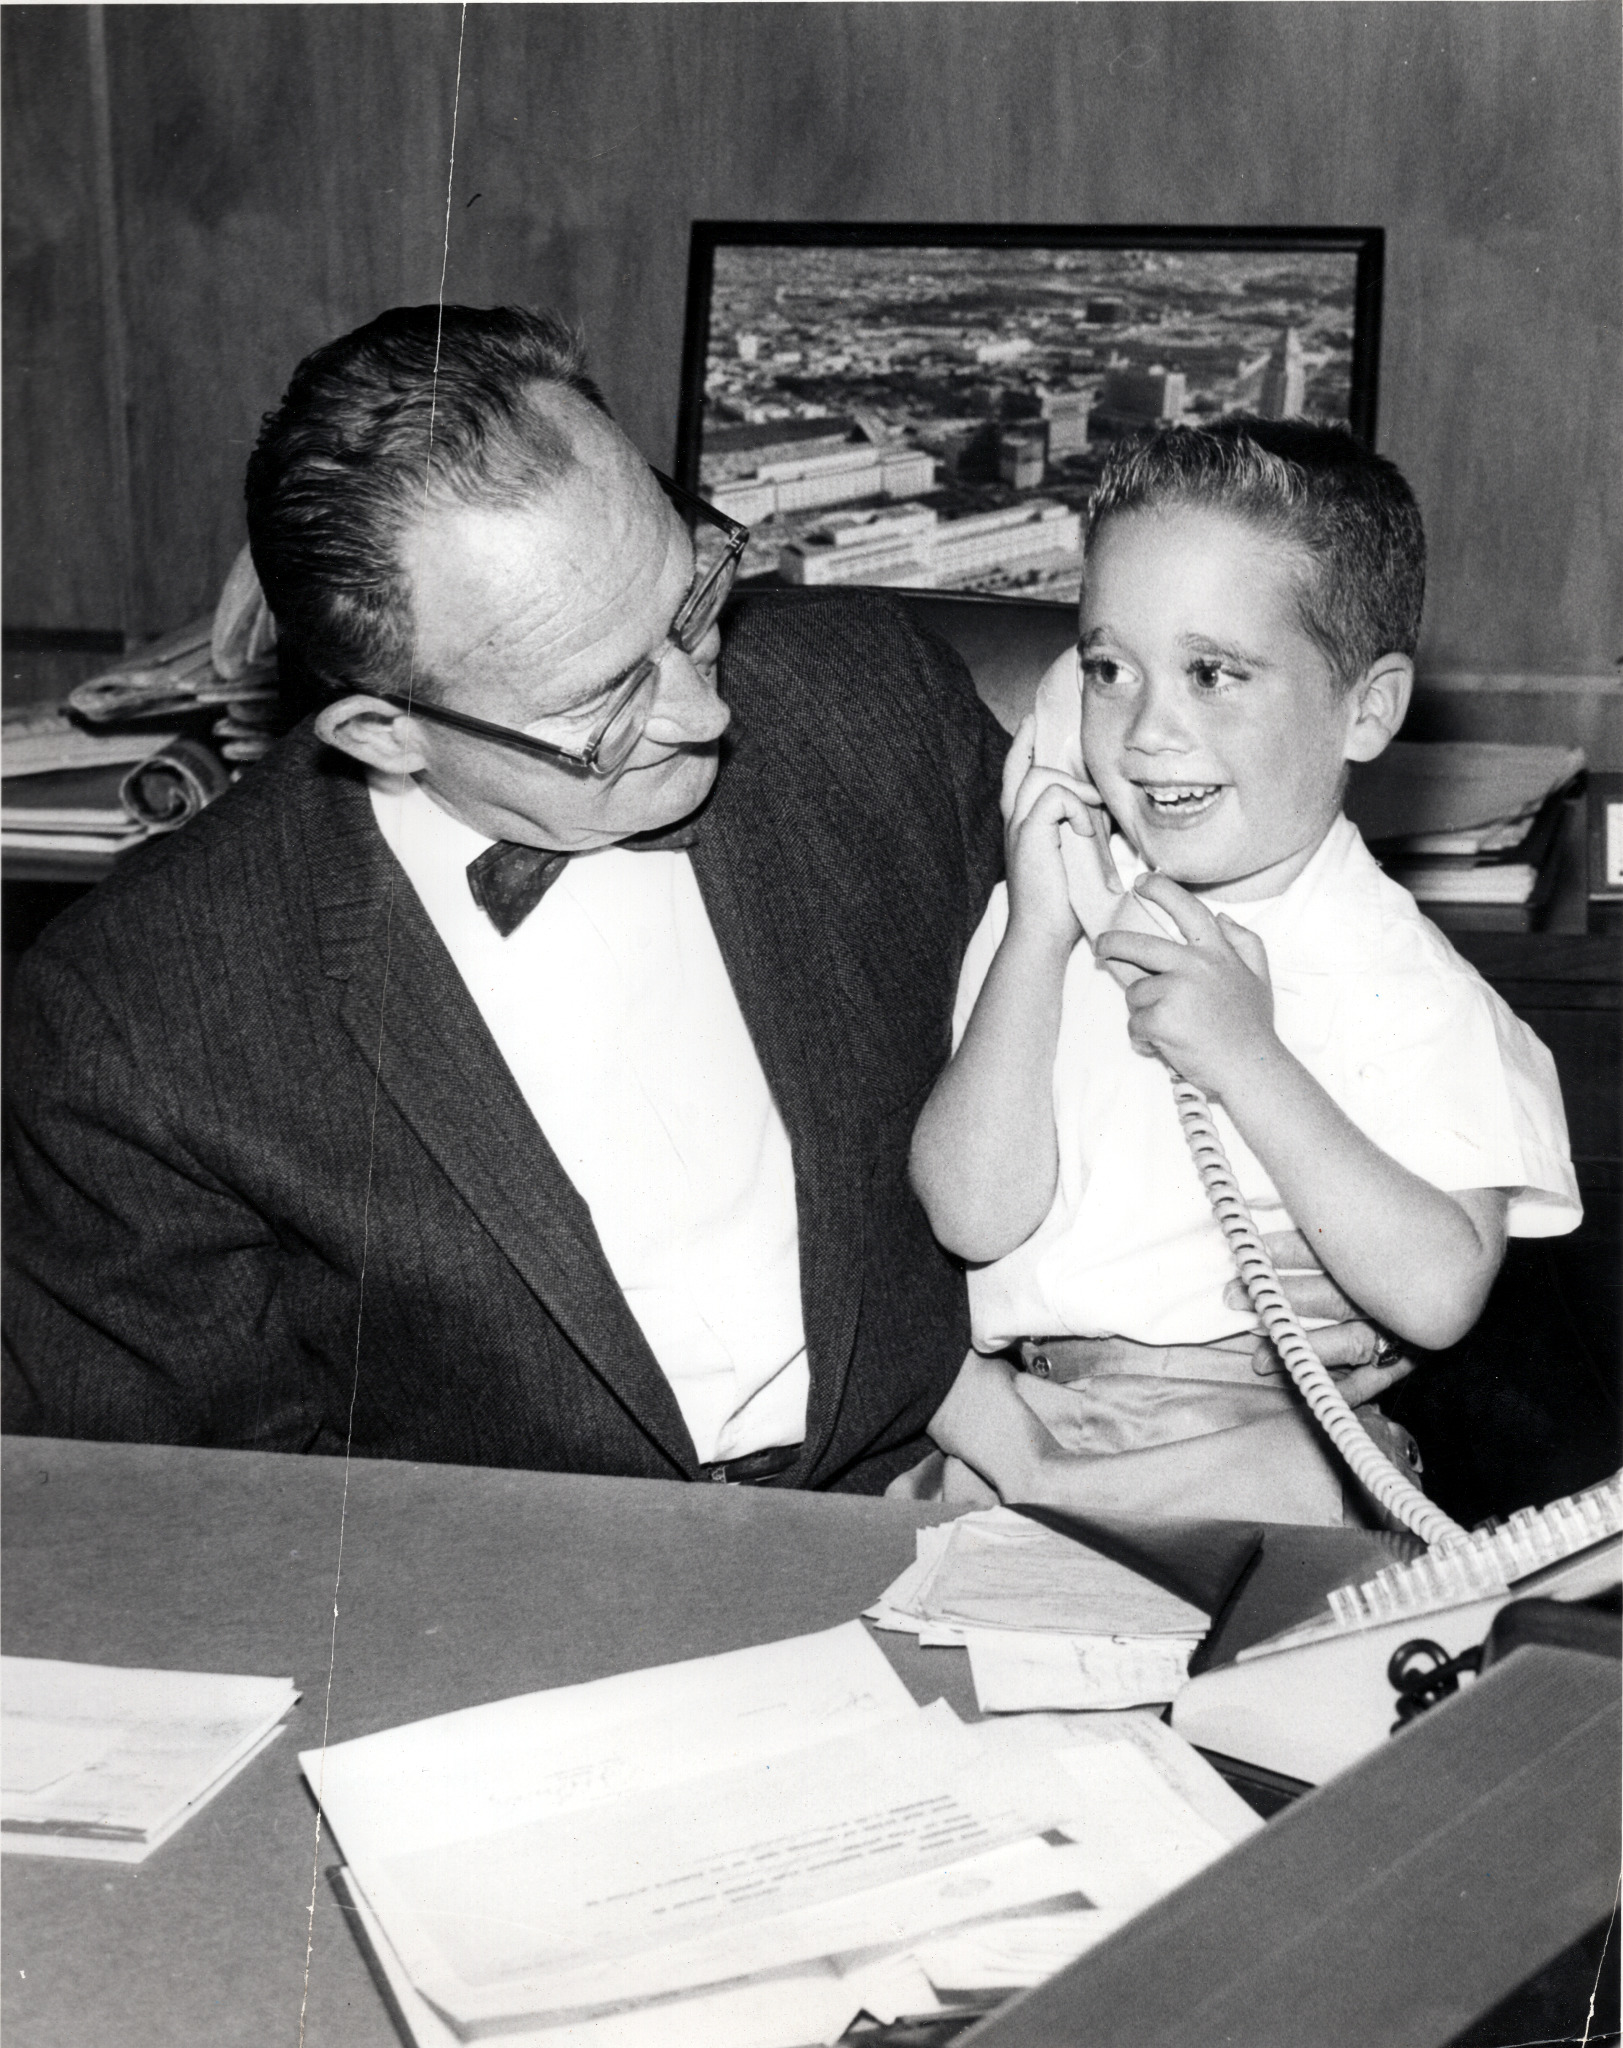 Buddy & Chief Deputy Supervisor - Kidney Disease Foundation - 1959